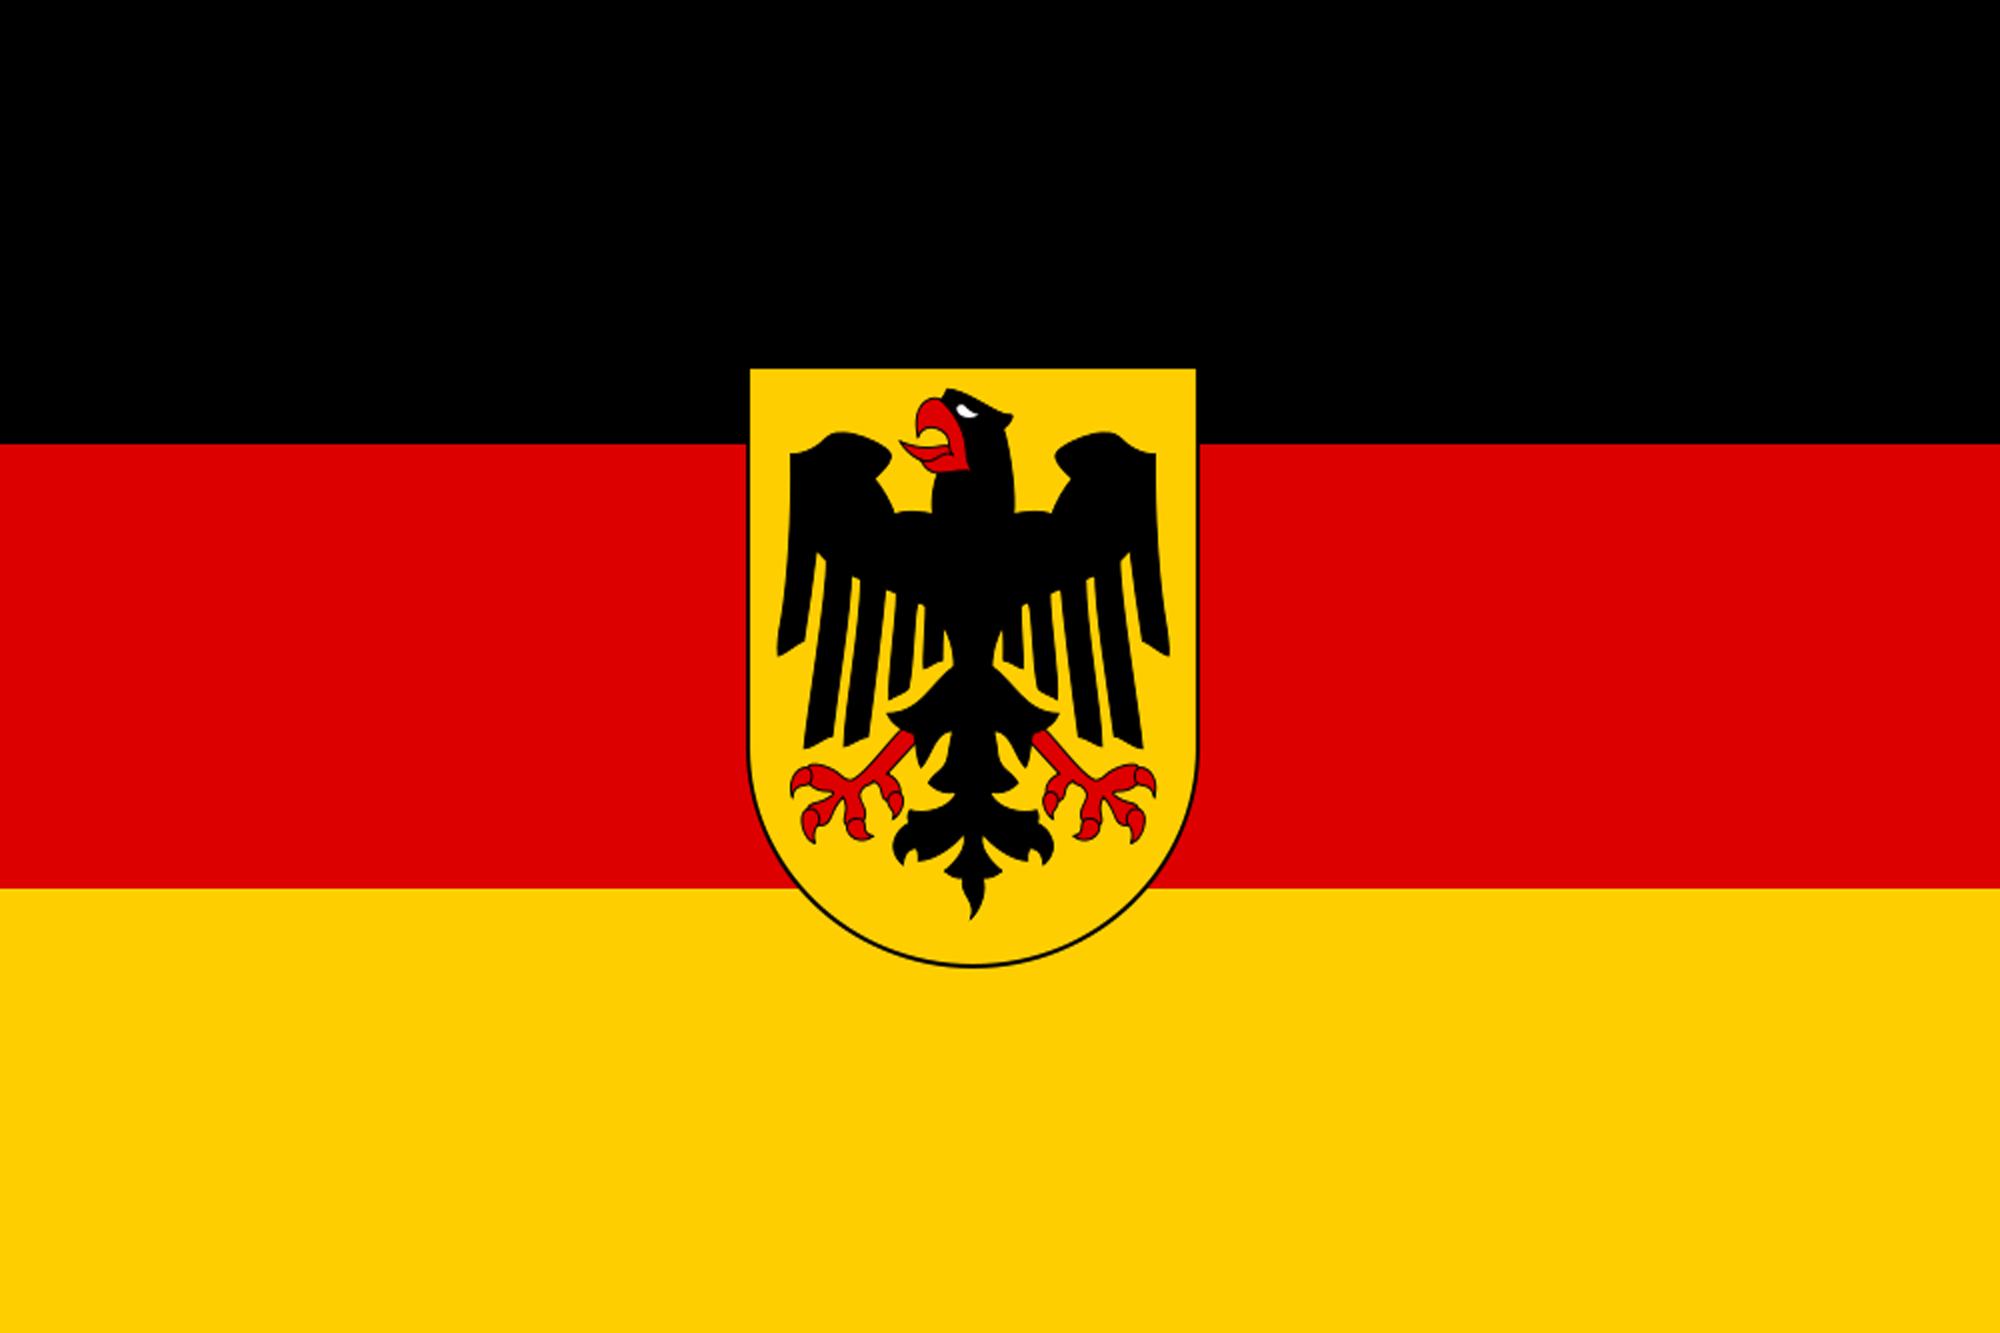 Bandera Estatal de Alemania.png